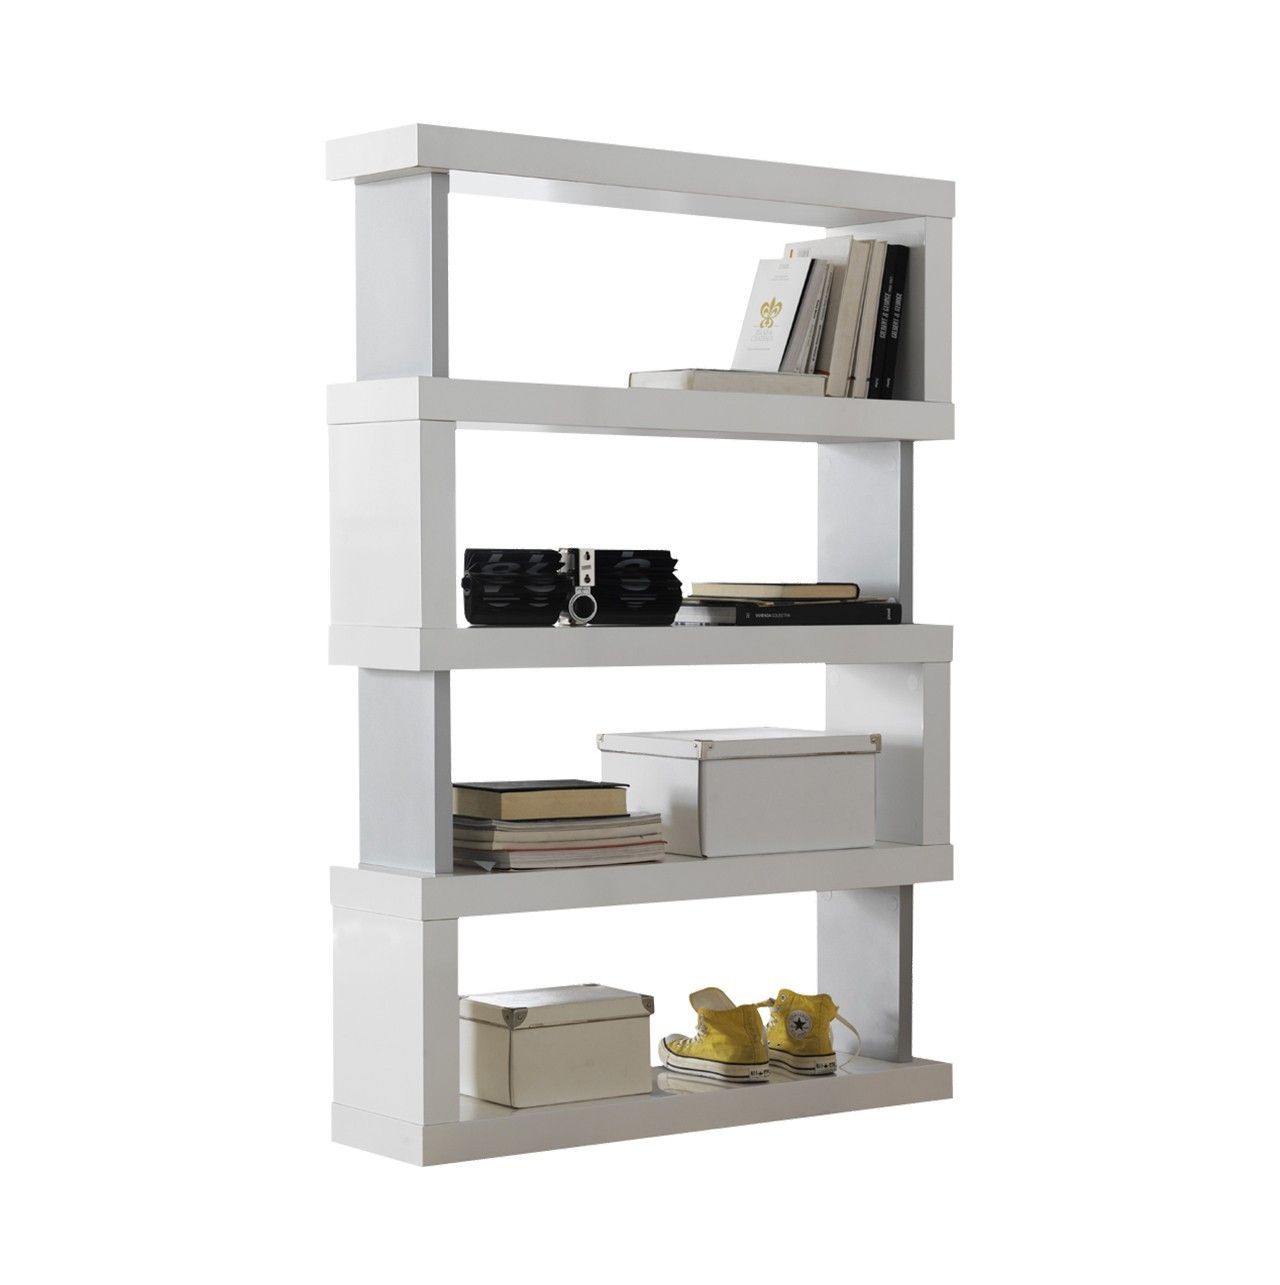 Estanter a separador de ambientes de 4 estantes con - Estanterias separadoras de ambientes ...